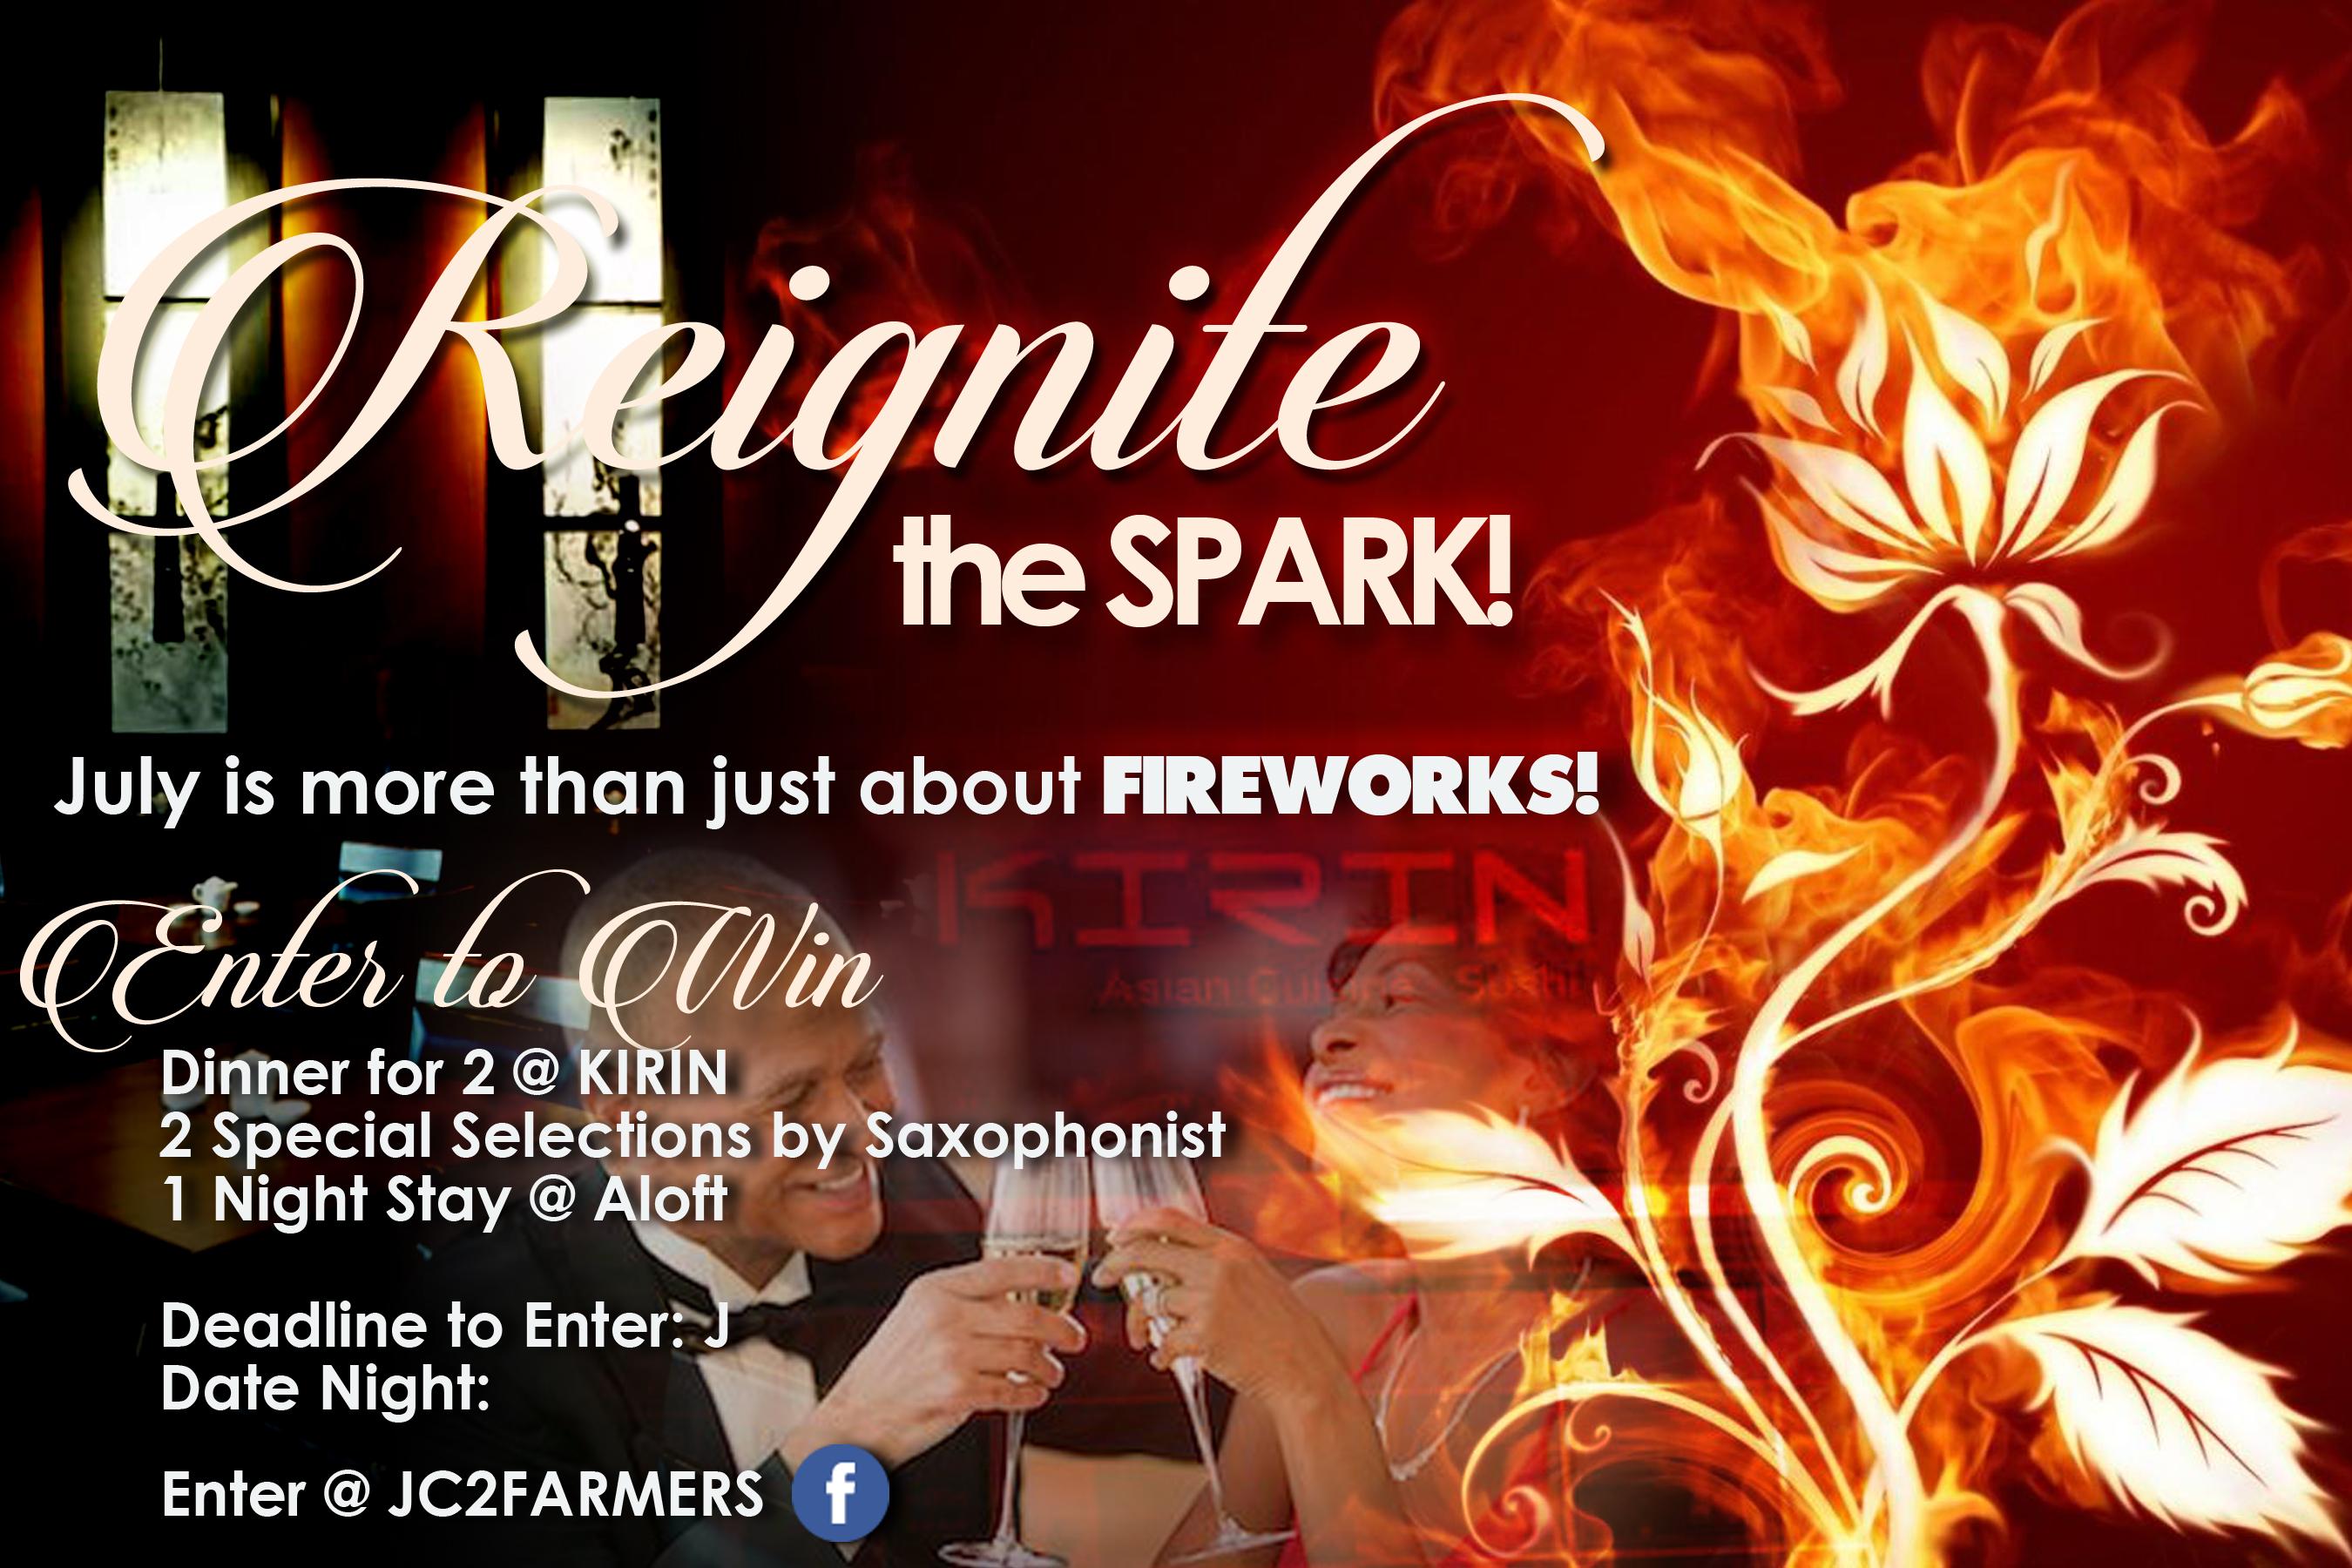 reignite the spark 2018 flyer 6x9